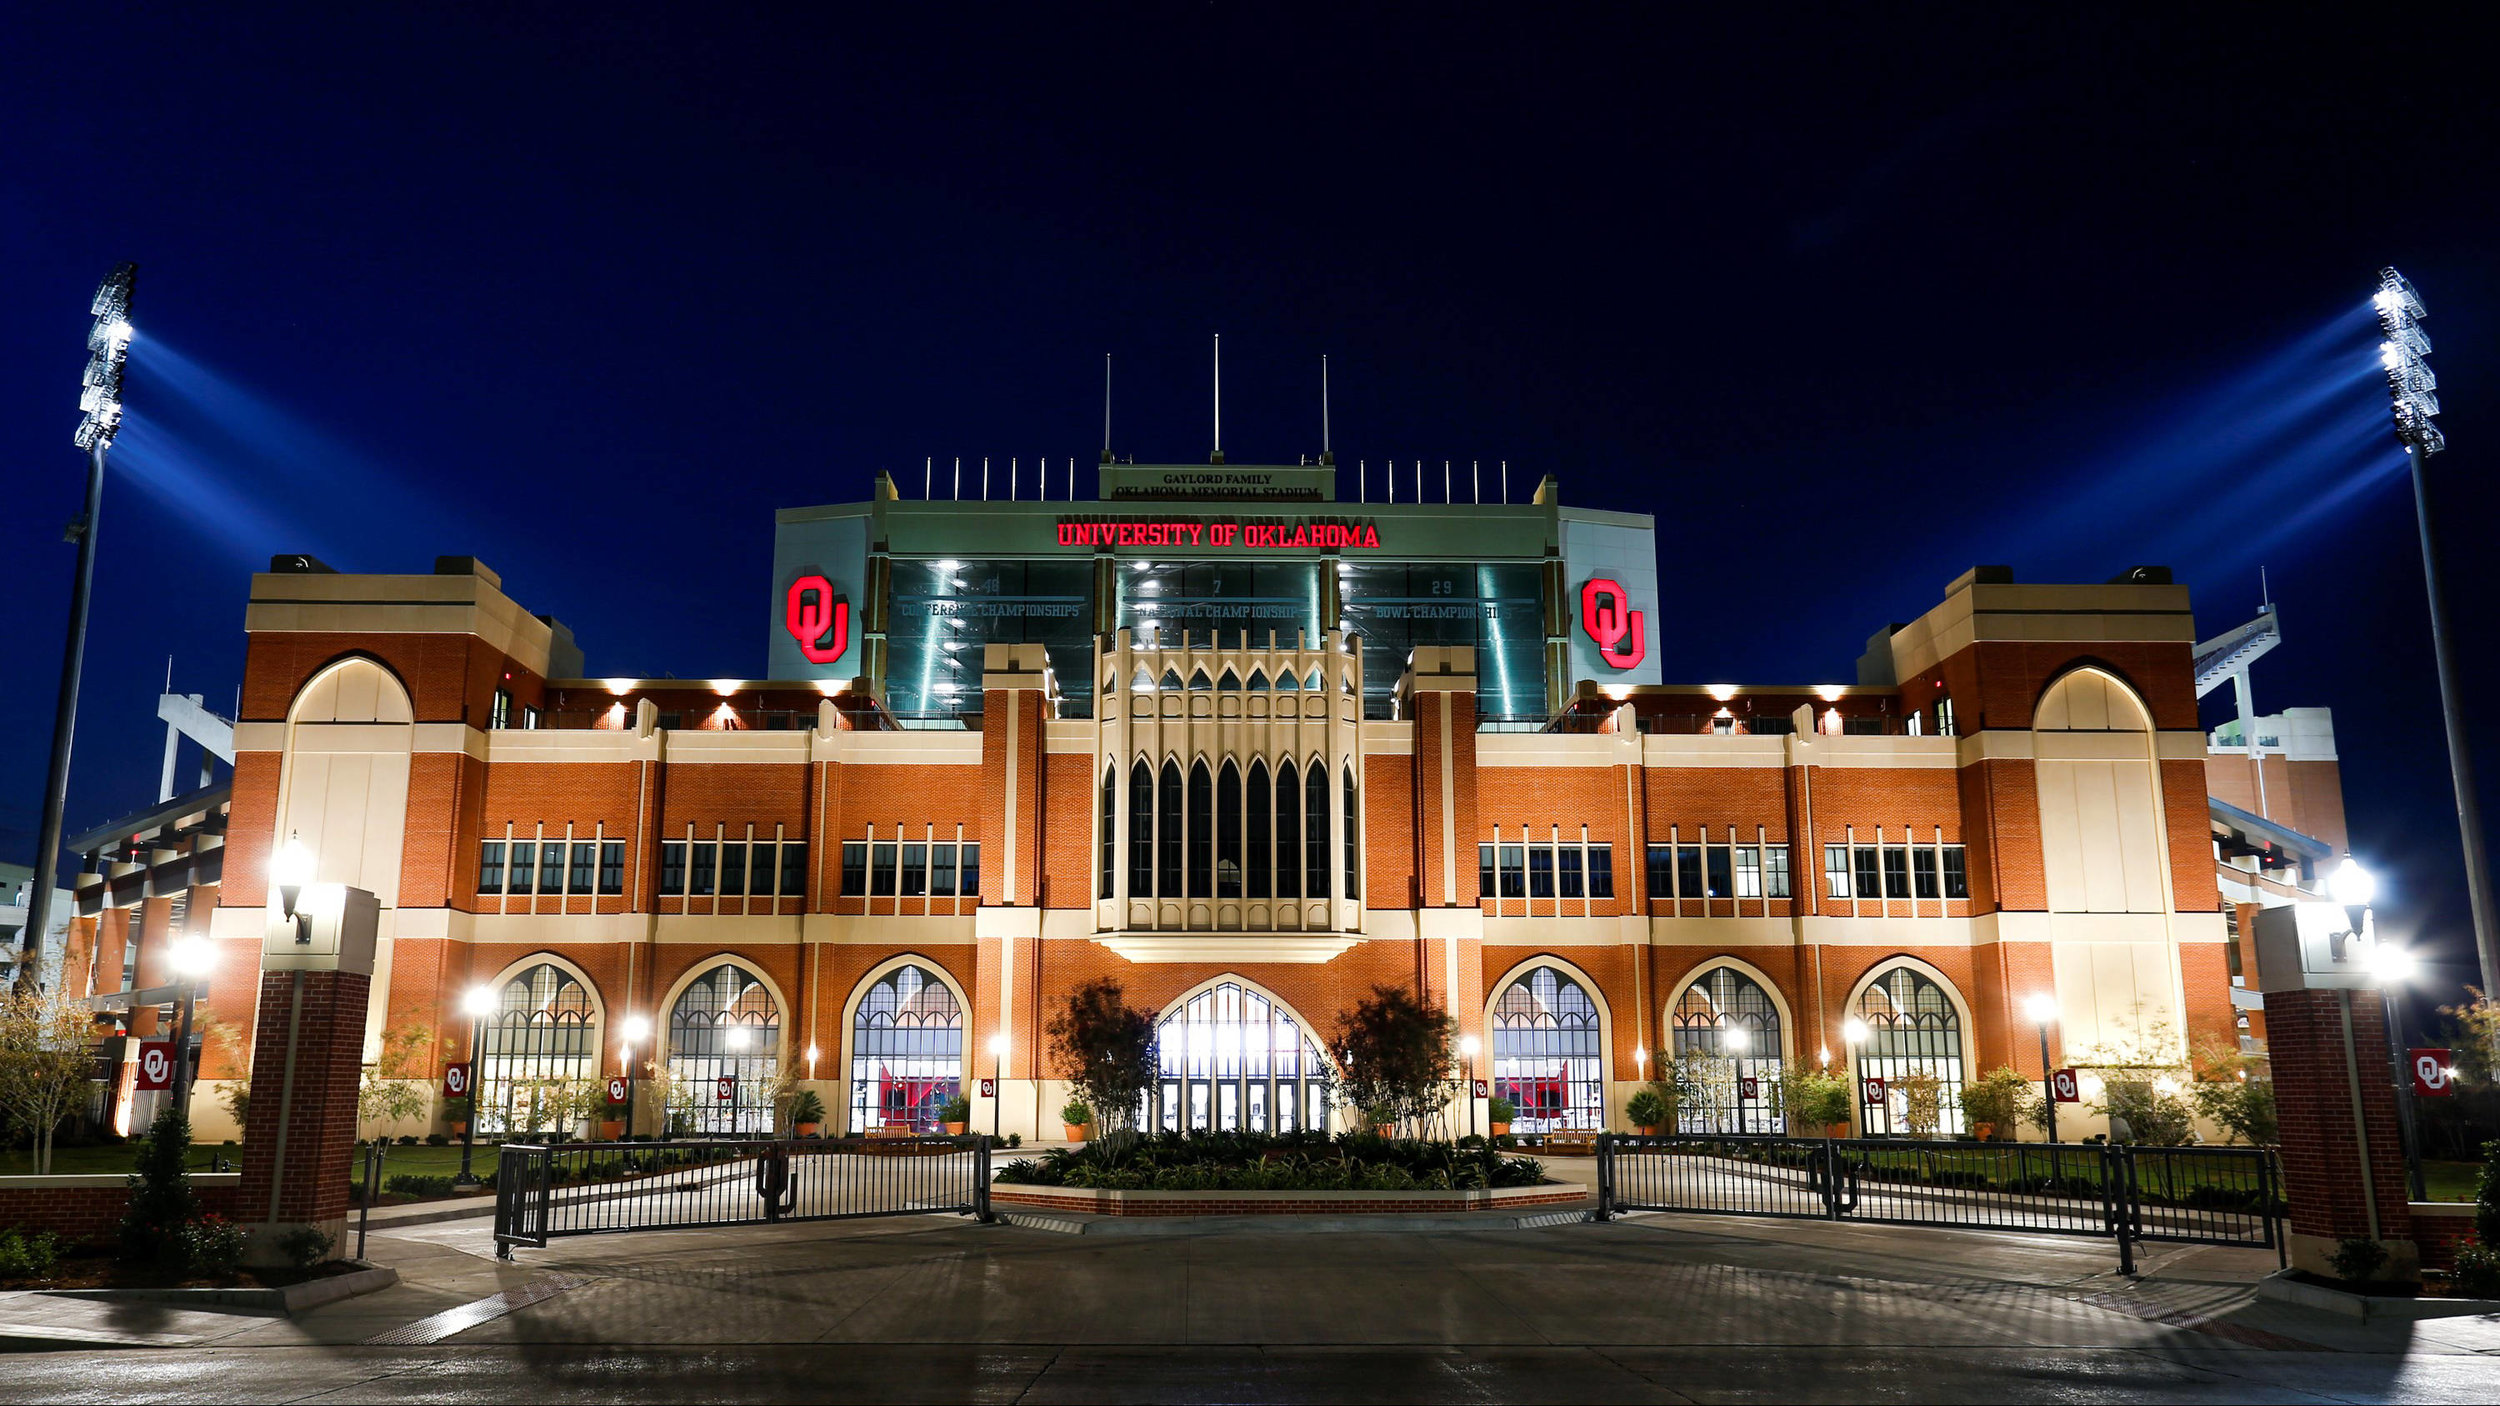 OU stadium night.jpg